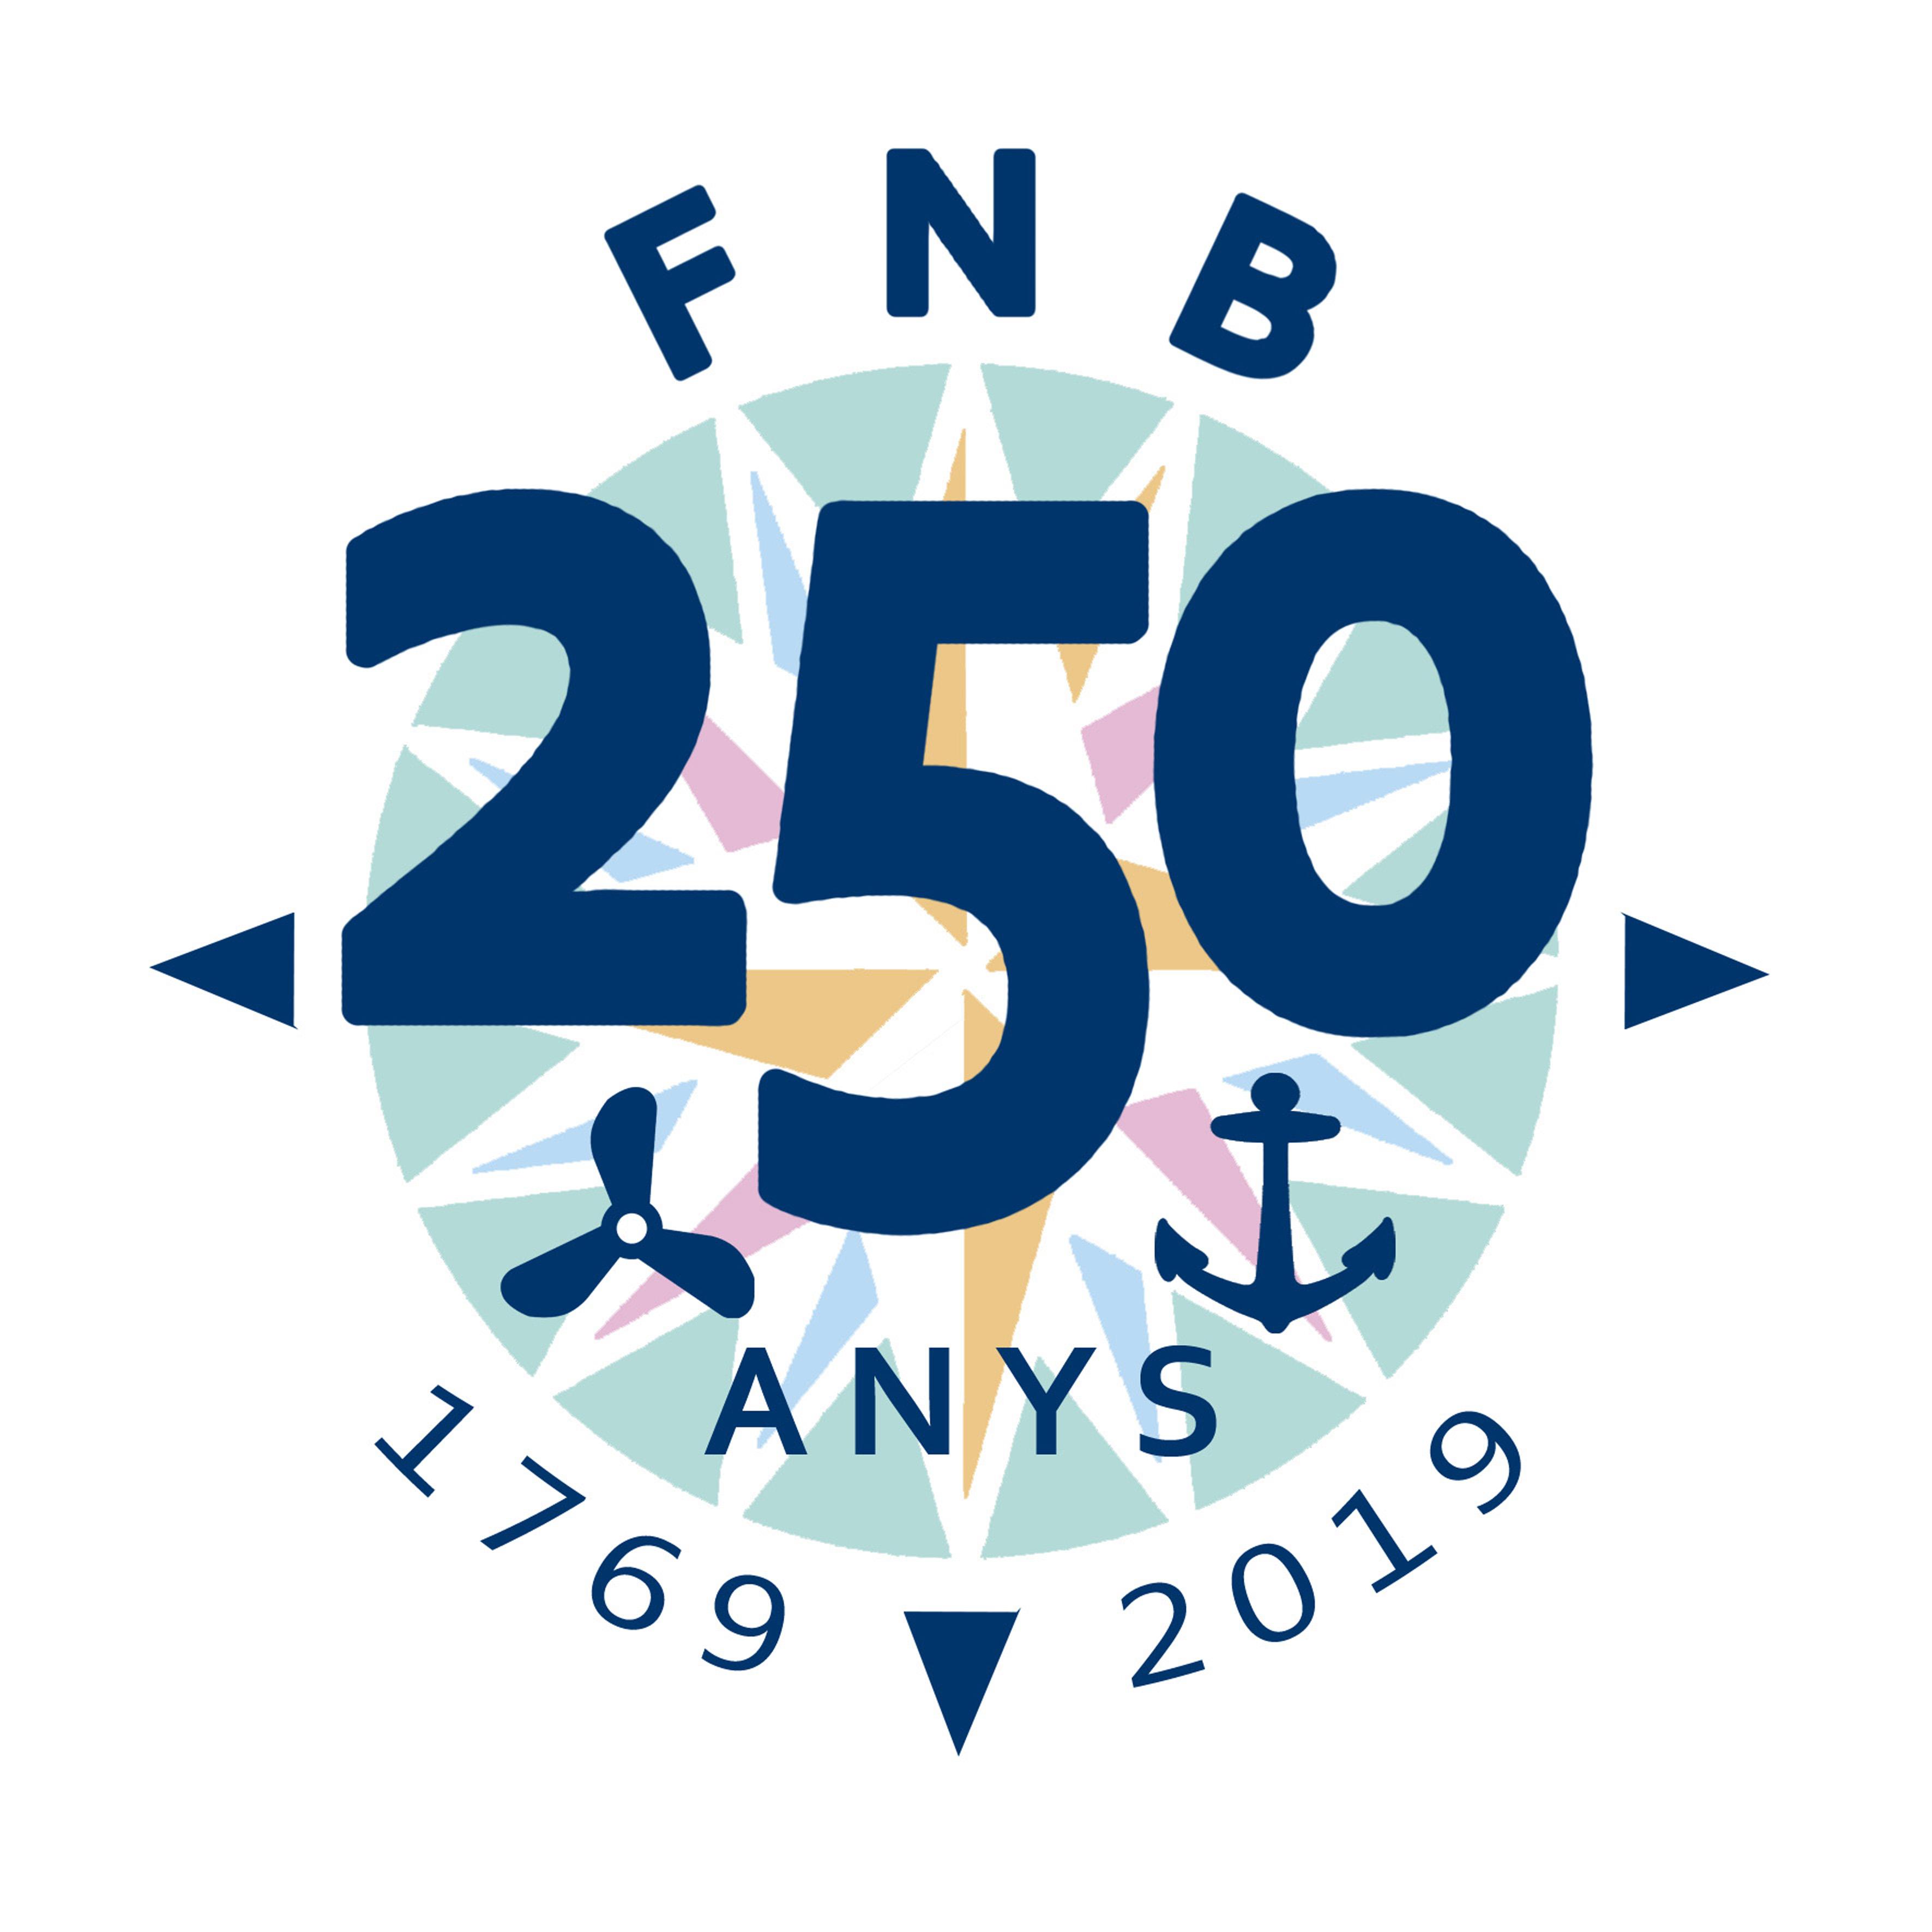 fnb-250-logo.jpg